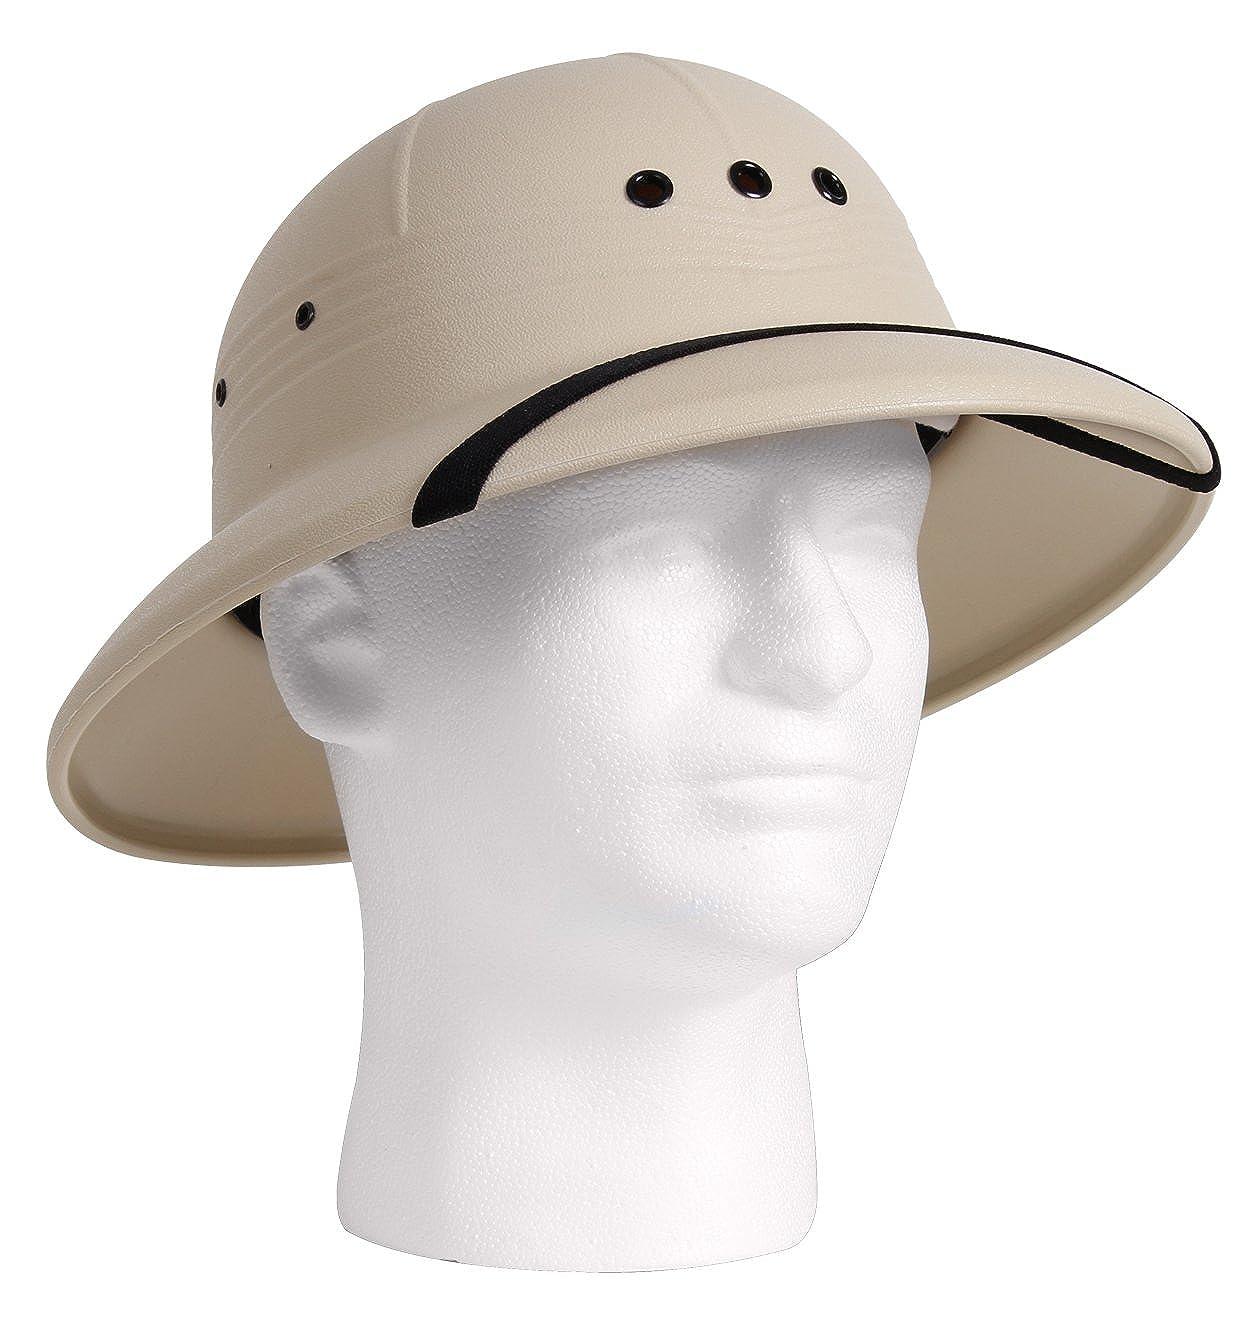 c3077d4f06a85 Amazon.com  Rothco Pith Helmet